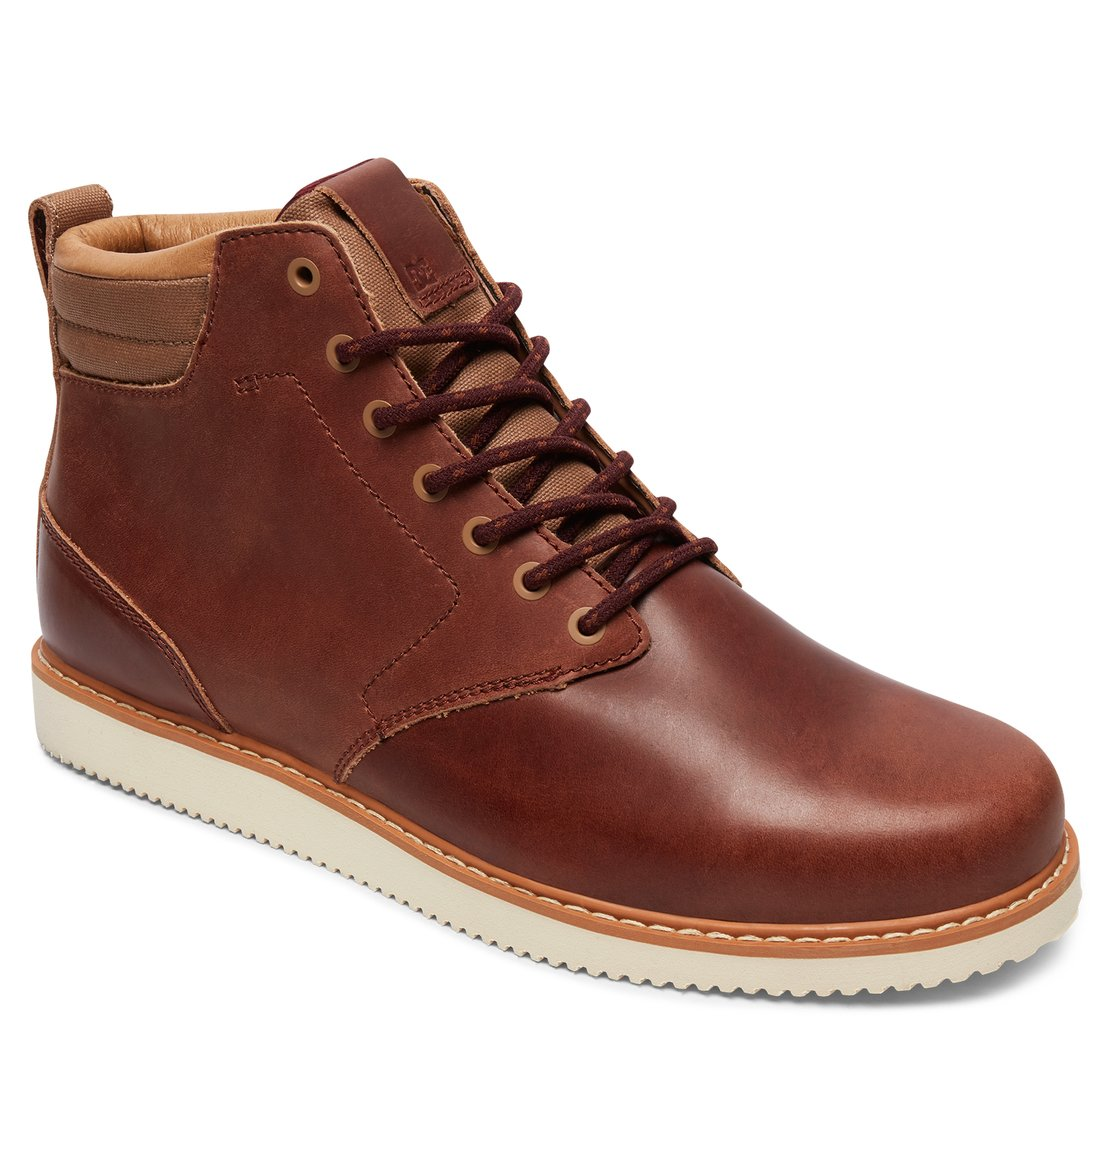 Mason LX - Winterstiefel für Männer ADYB700012   DC Shoes 6e8a937427